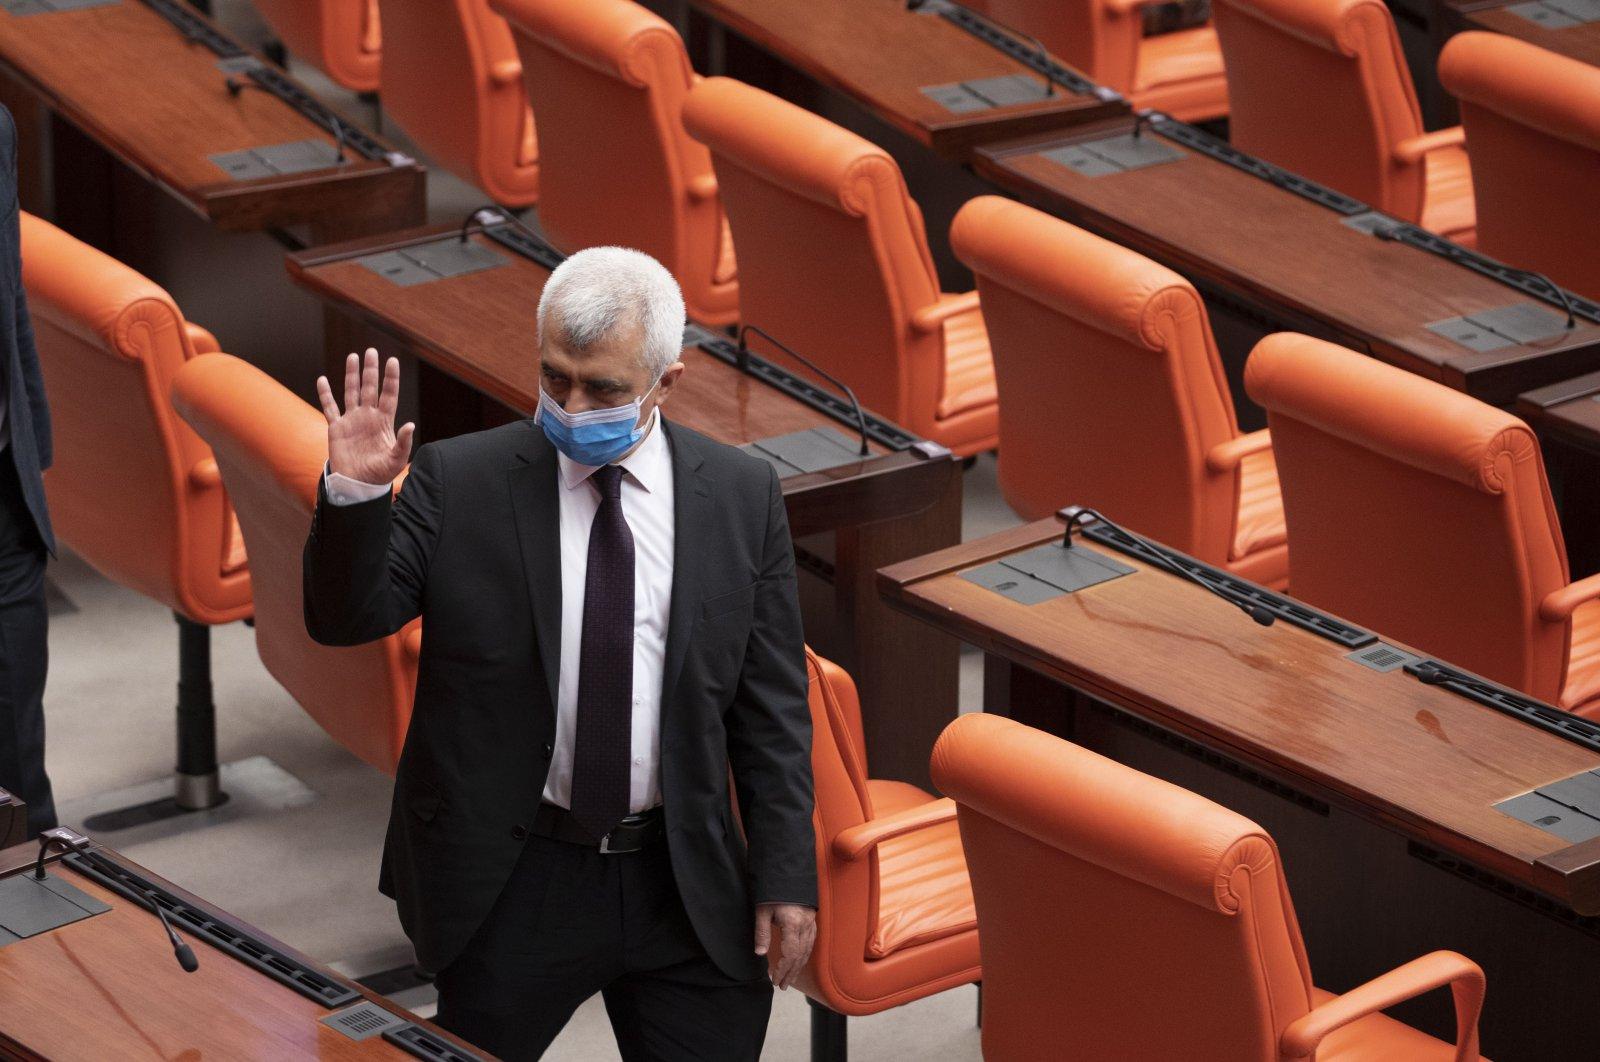 Then-HDP deputy  Ömer Faruk Gergerlioğlu waves after a session in the Turkish Parliament, Ankara, Turkey, March 17, 2021. (AA)